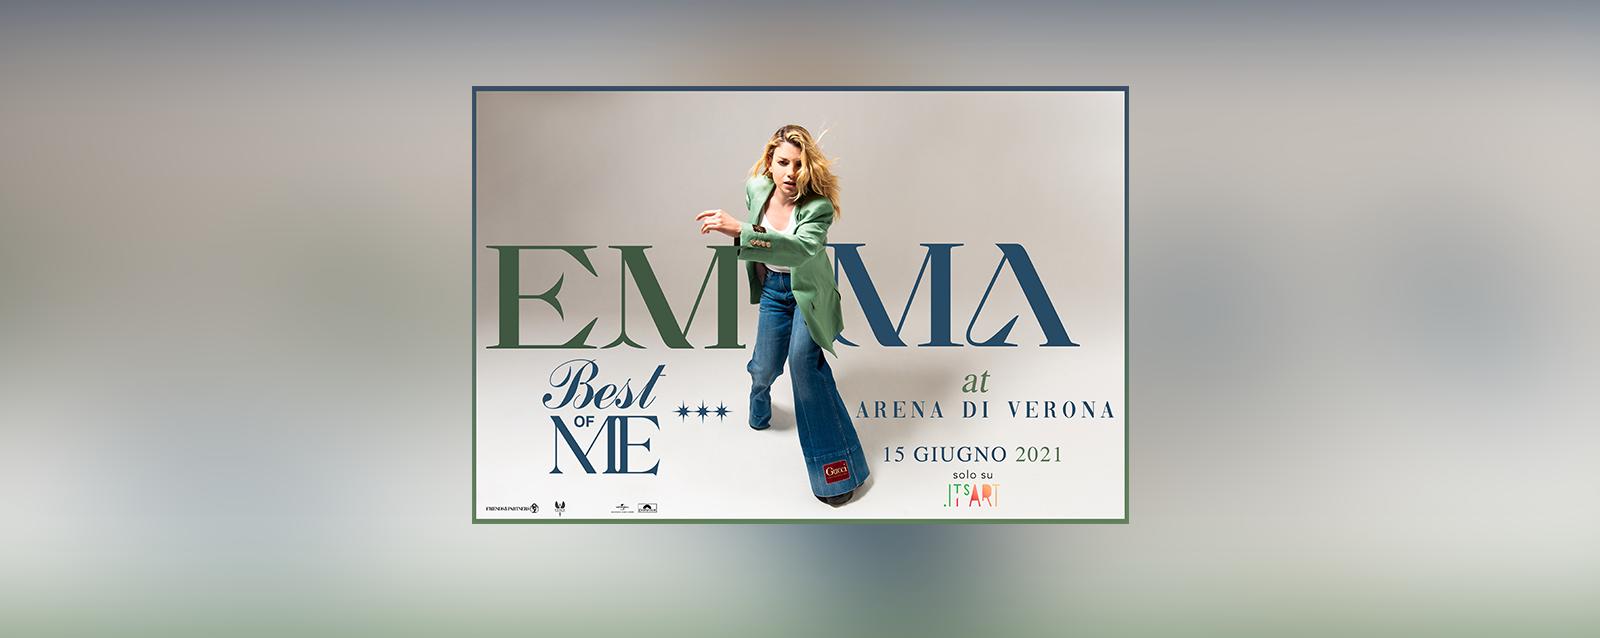 "Emma Marrone ""Best of me at Arena di Verona"""